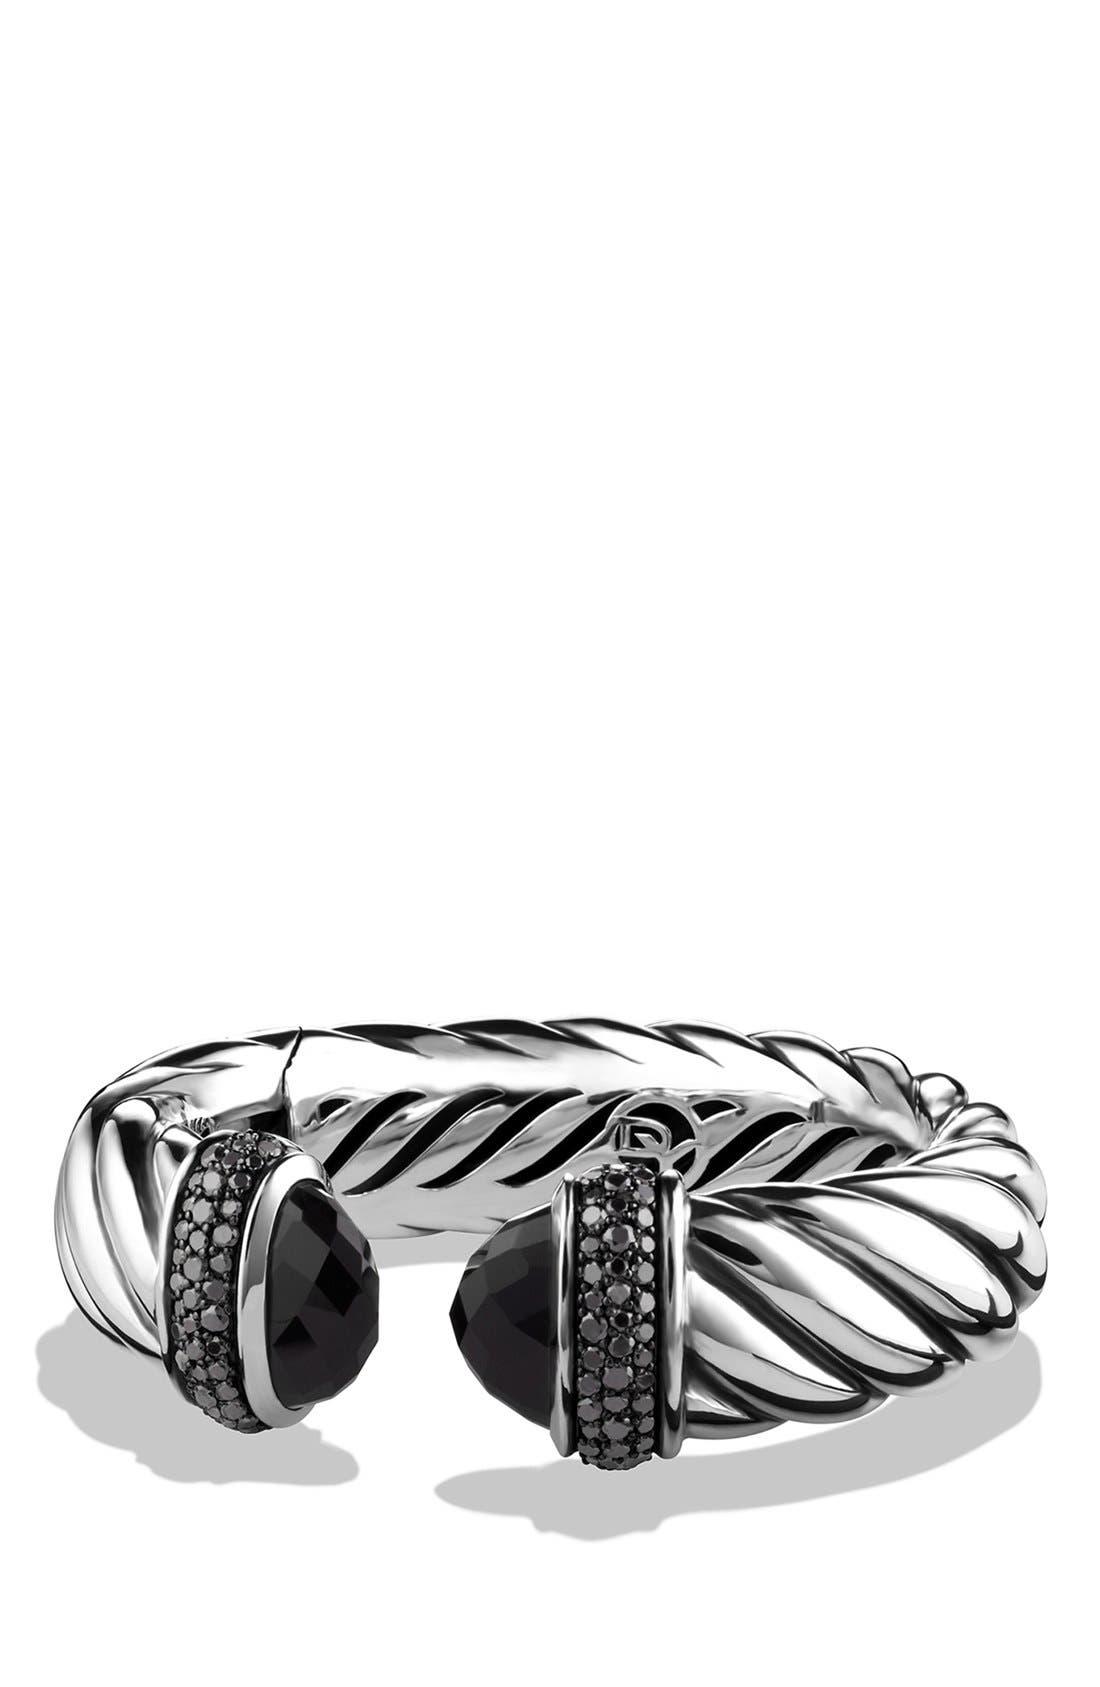 Alternate Image 1 Selected - David Yurman 'Waverly' Bracelet with Semiprecious Stones & Gems